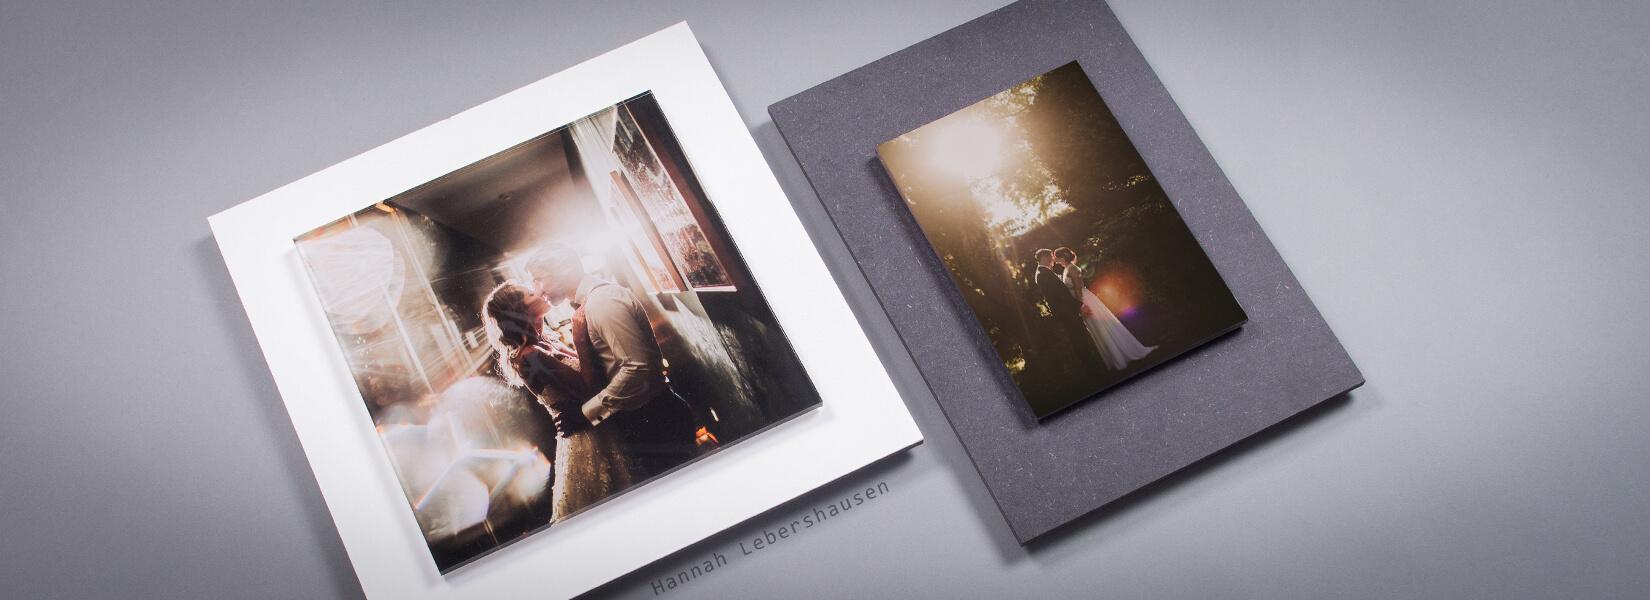 nPhoto Acrylic Prints for professional photographers